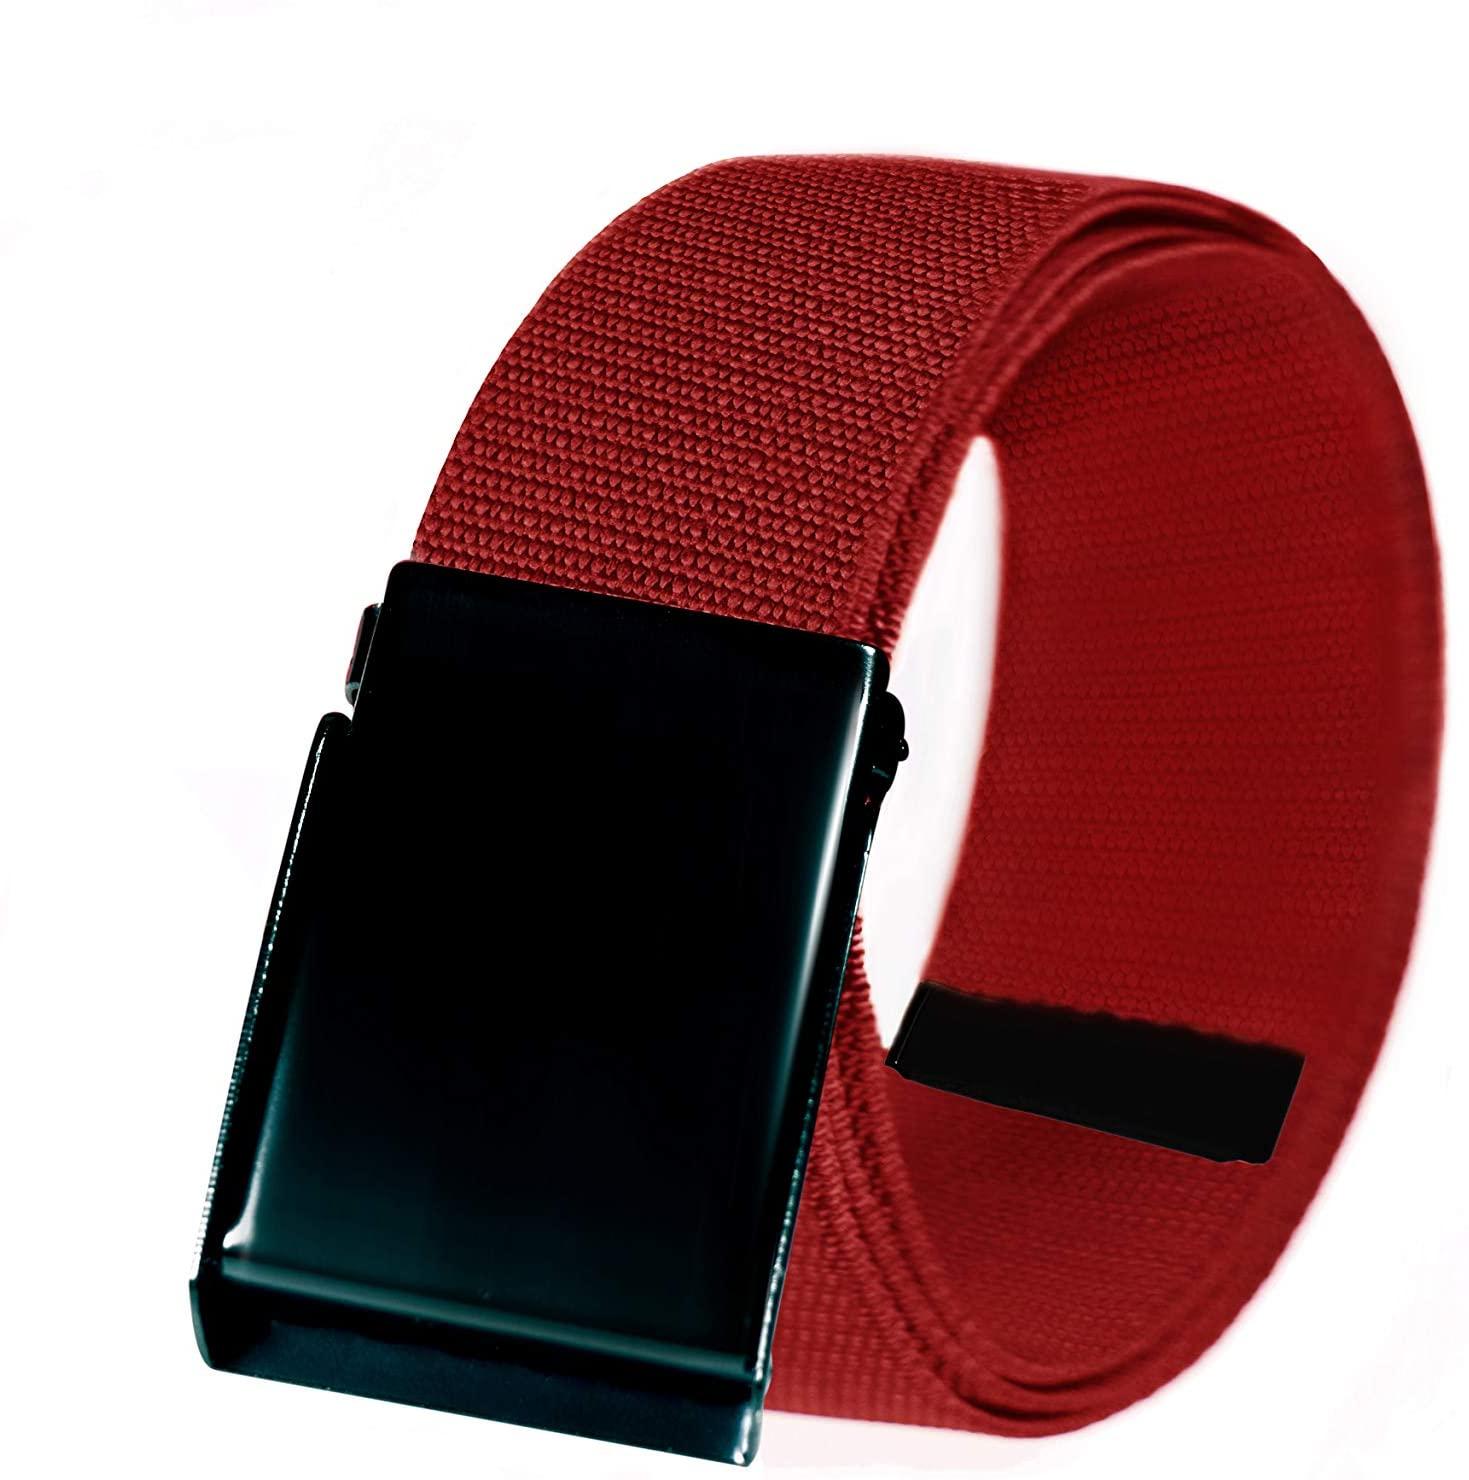 IWTBWYED Men's & Boys' Canvas Belts - Adjustable Canvas Belts (Crimson)